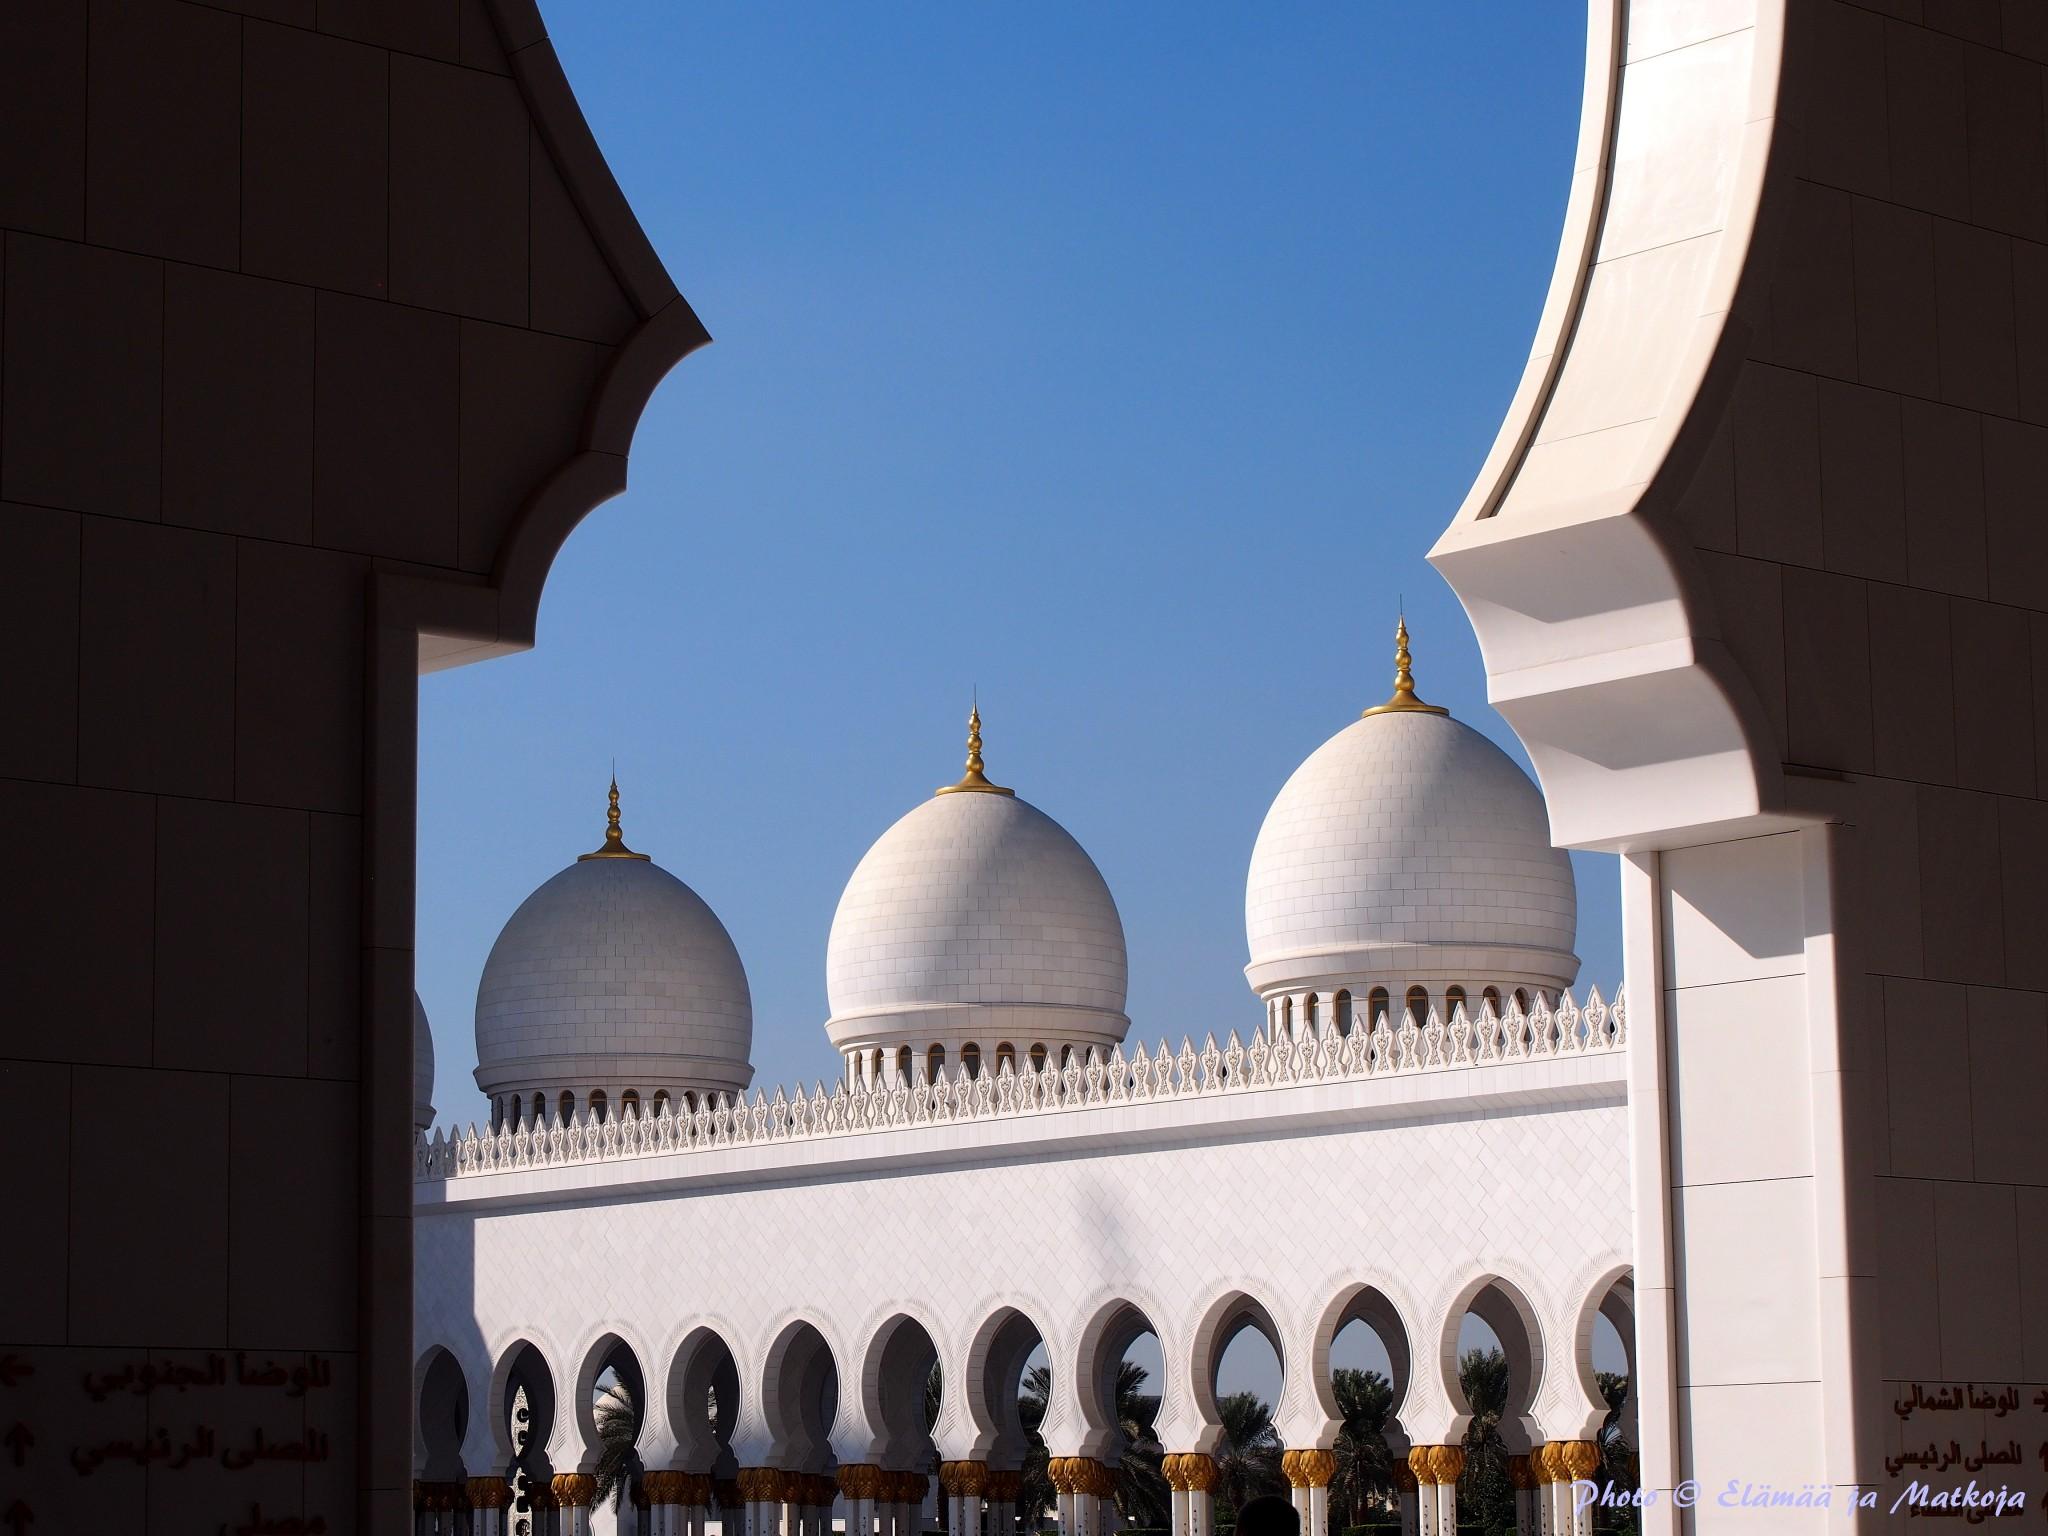 Sheikh Zayed Grand Mosque Abu Dhabi UAE Photo © Elämää ja Matkoja